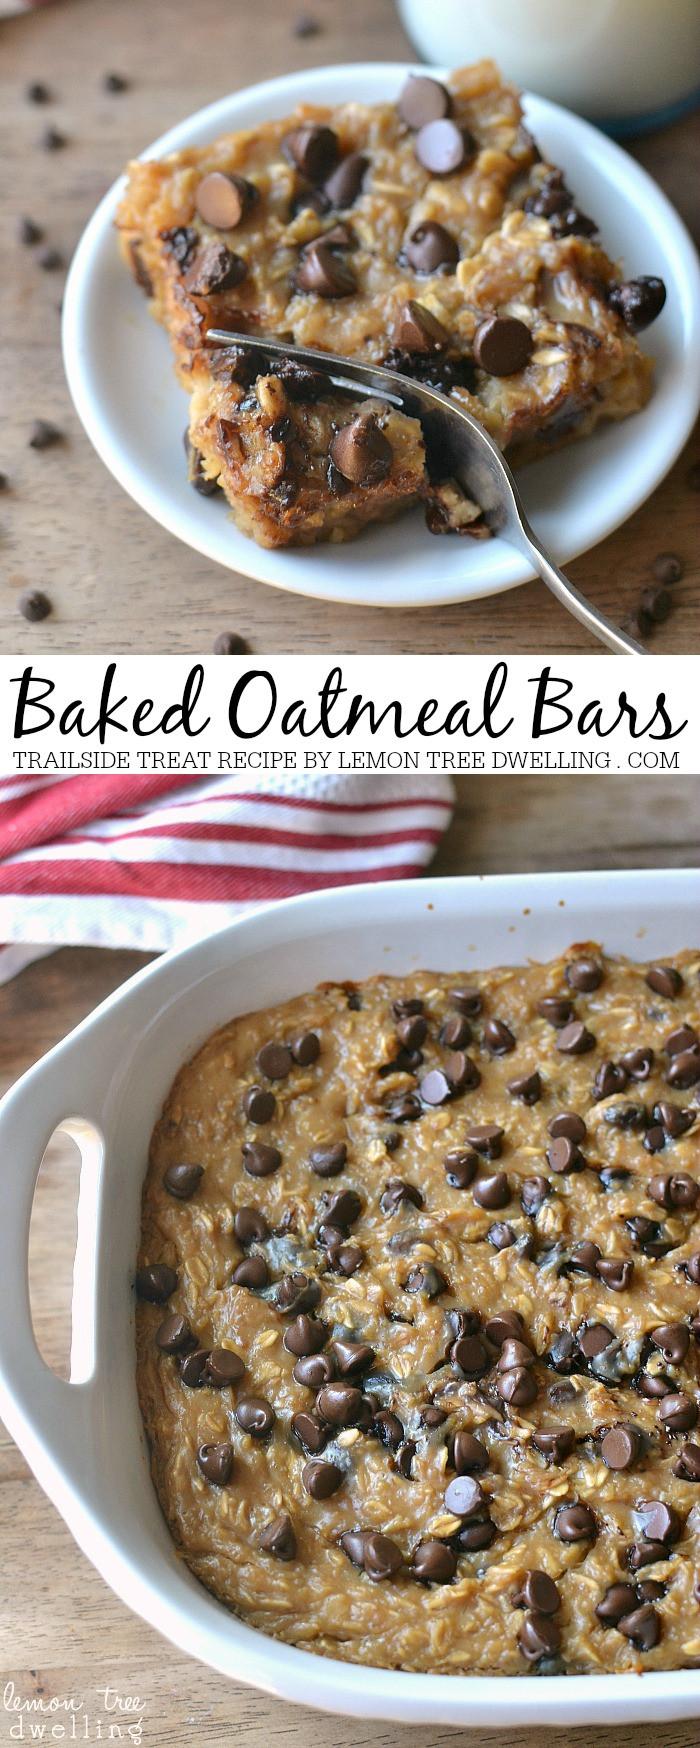 Oatmeal Recipe For Breakfast  Baked Oatmeal Trailside Treat Bars The 36th AVENUE